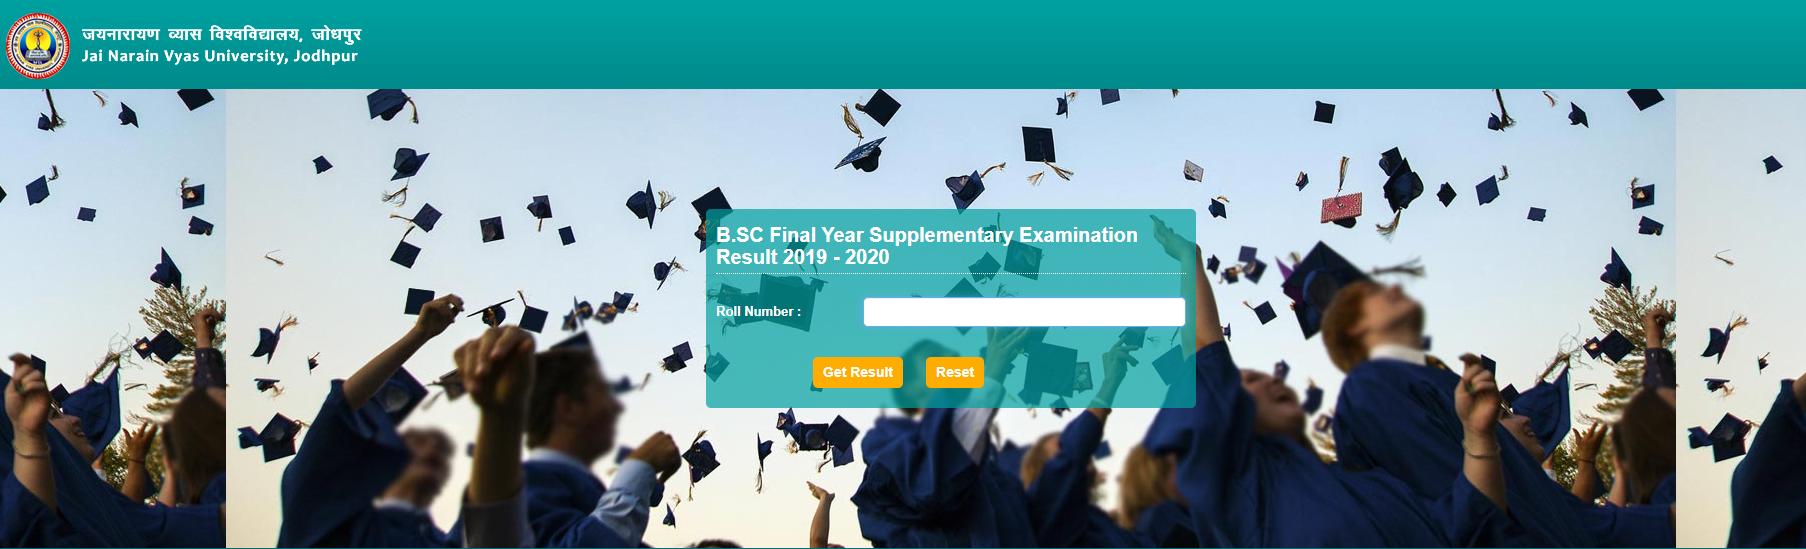 JNVU BSC Final Year Supplementary Exam Result